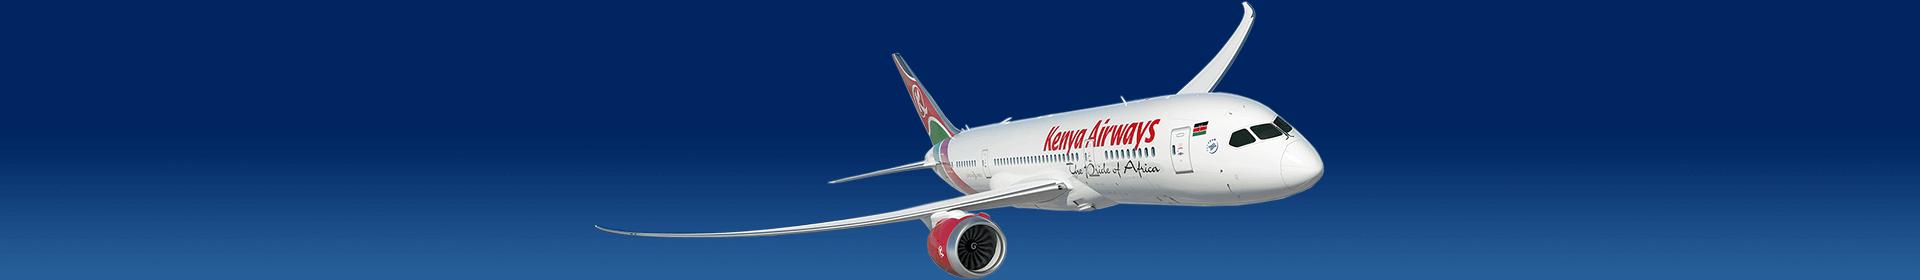 https://www.kenya-airways.com/uploadedImages/Content/Images/Plan_and_Book/787-8_.png